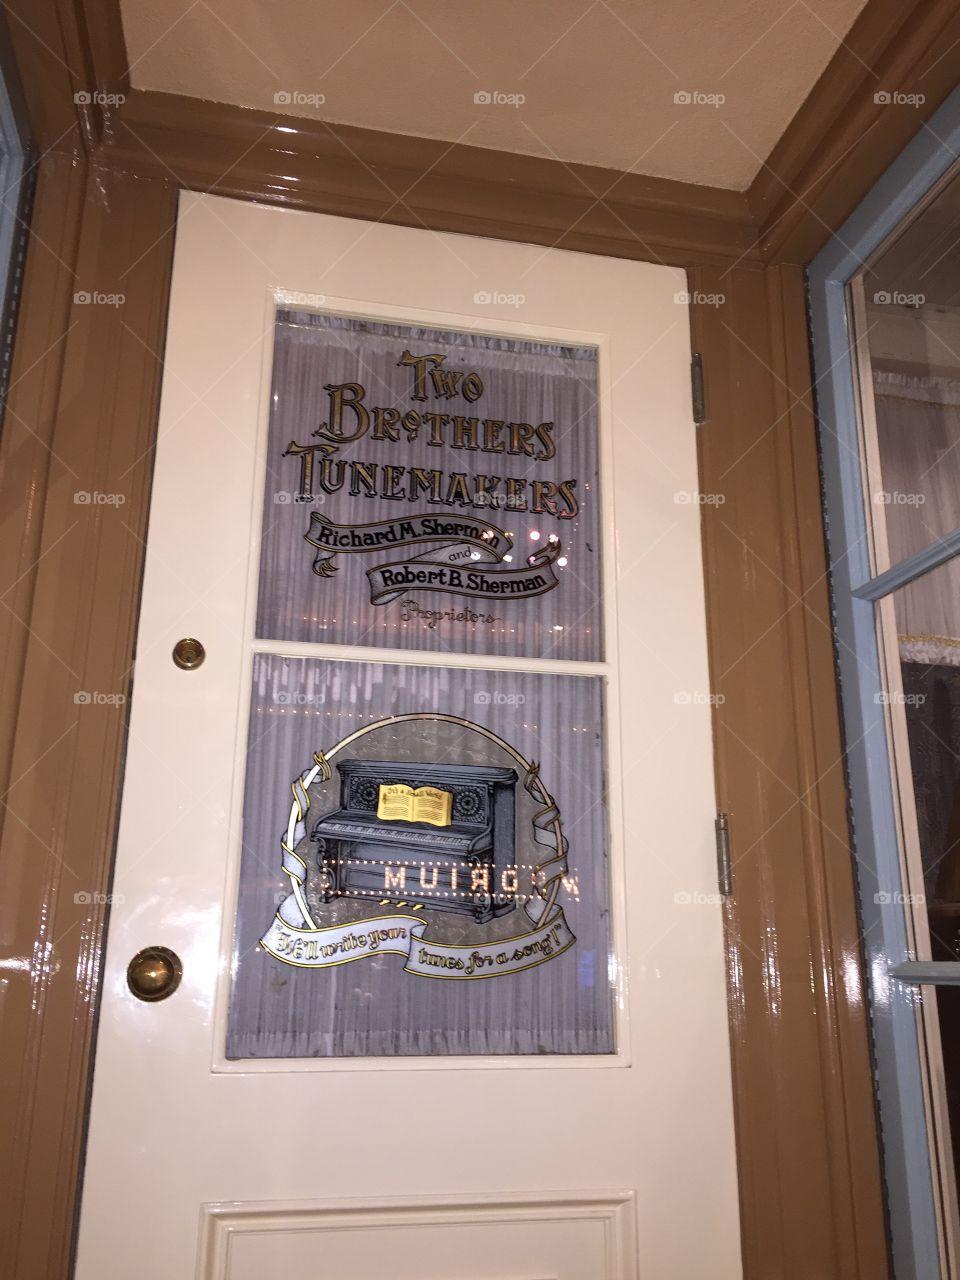 Disneyland Door Dècor. Sherman Brothers. The Brothers Tunemakers. Anaheim, California. May 2019.